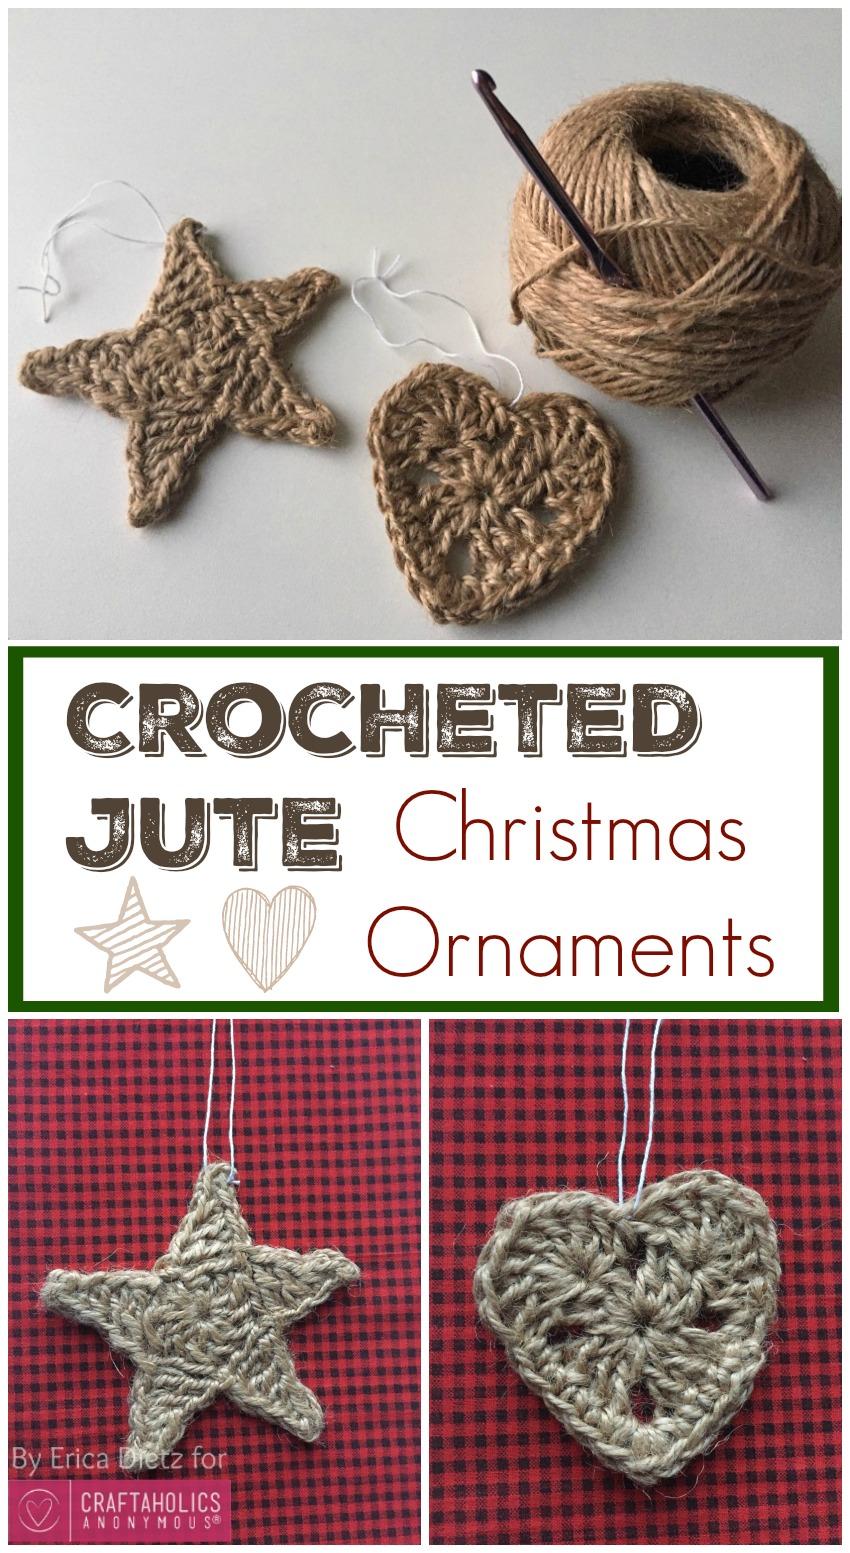 Crocheted Jute Christmas Ornaments